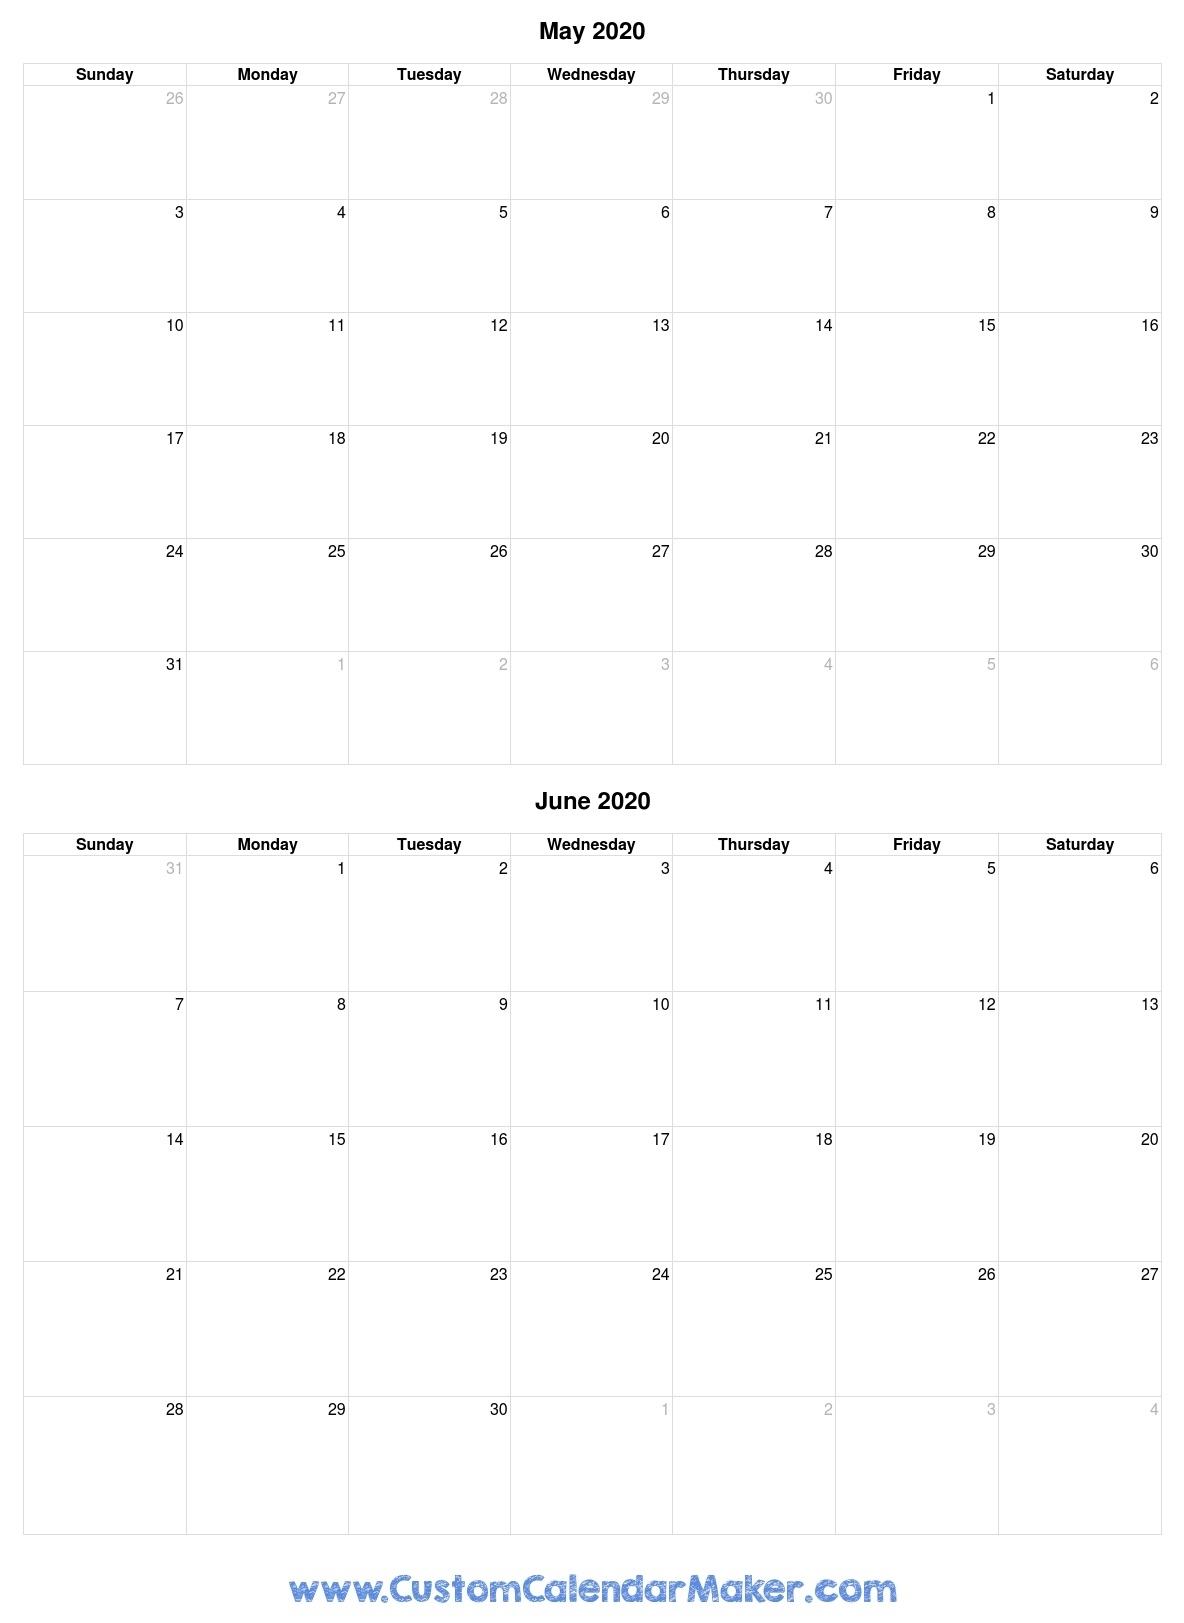 May And June 2020 Free Printable Calendar Template in 2020 Printable Fill In Calendar